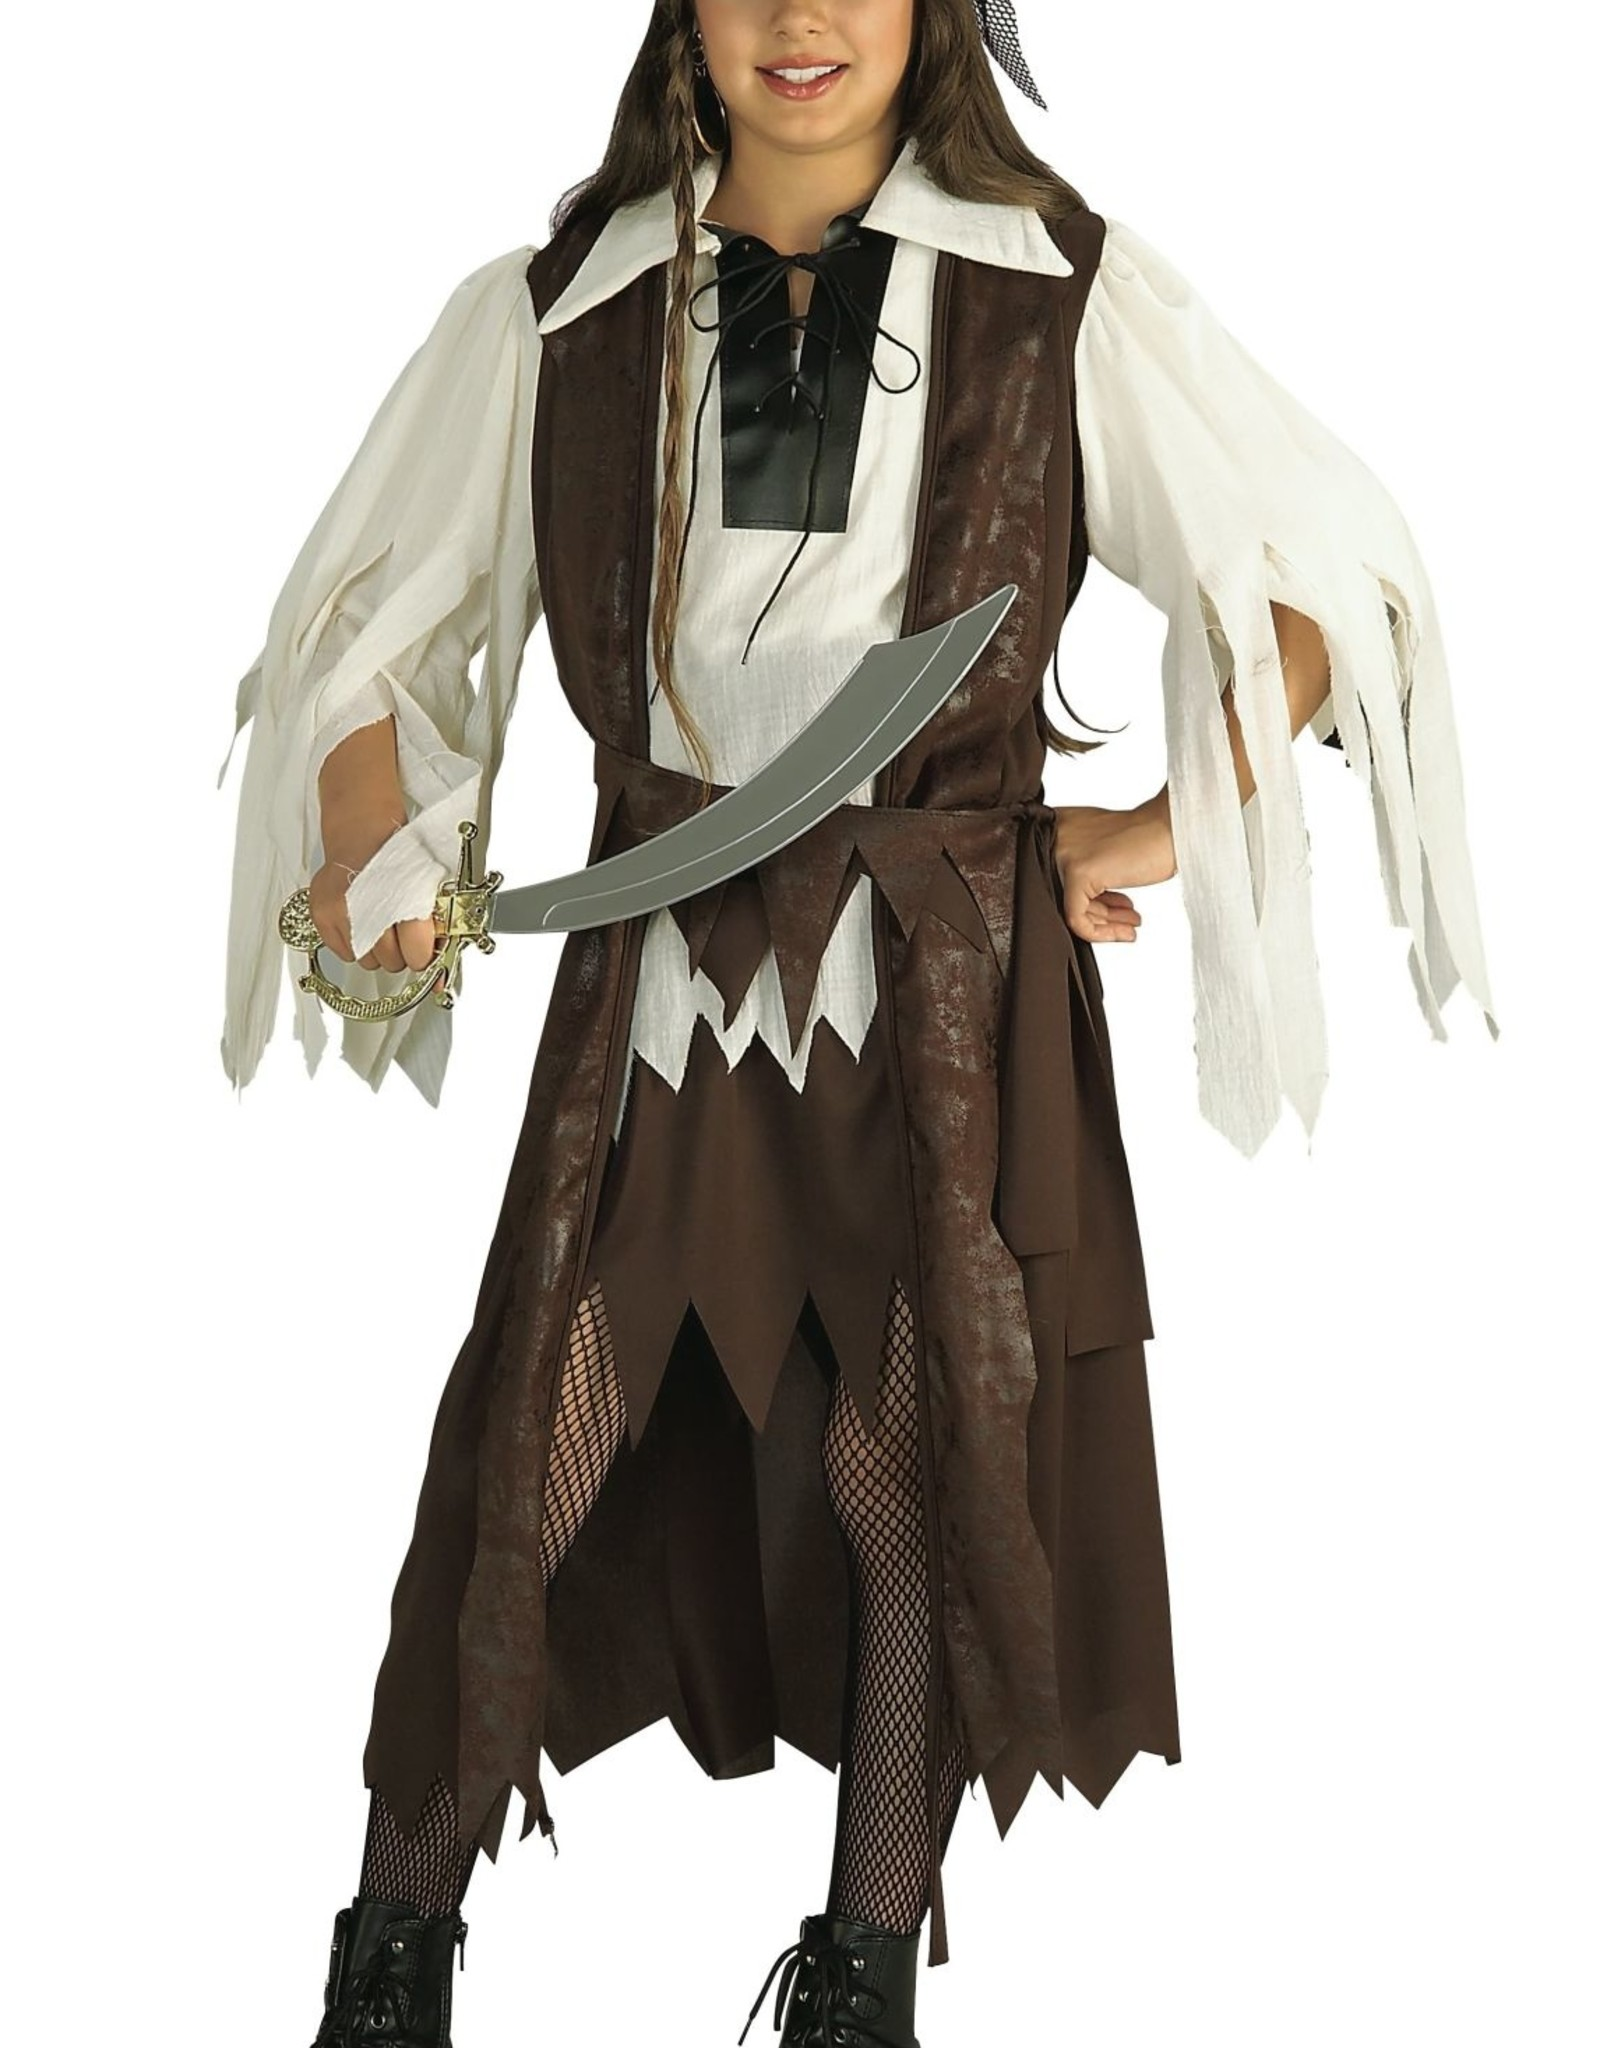 Caribbean Pirate Queen Costume